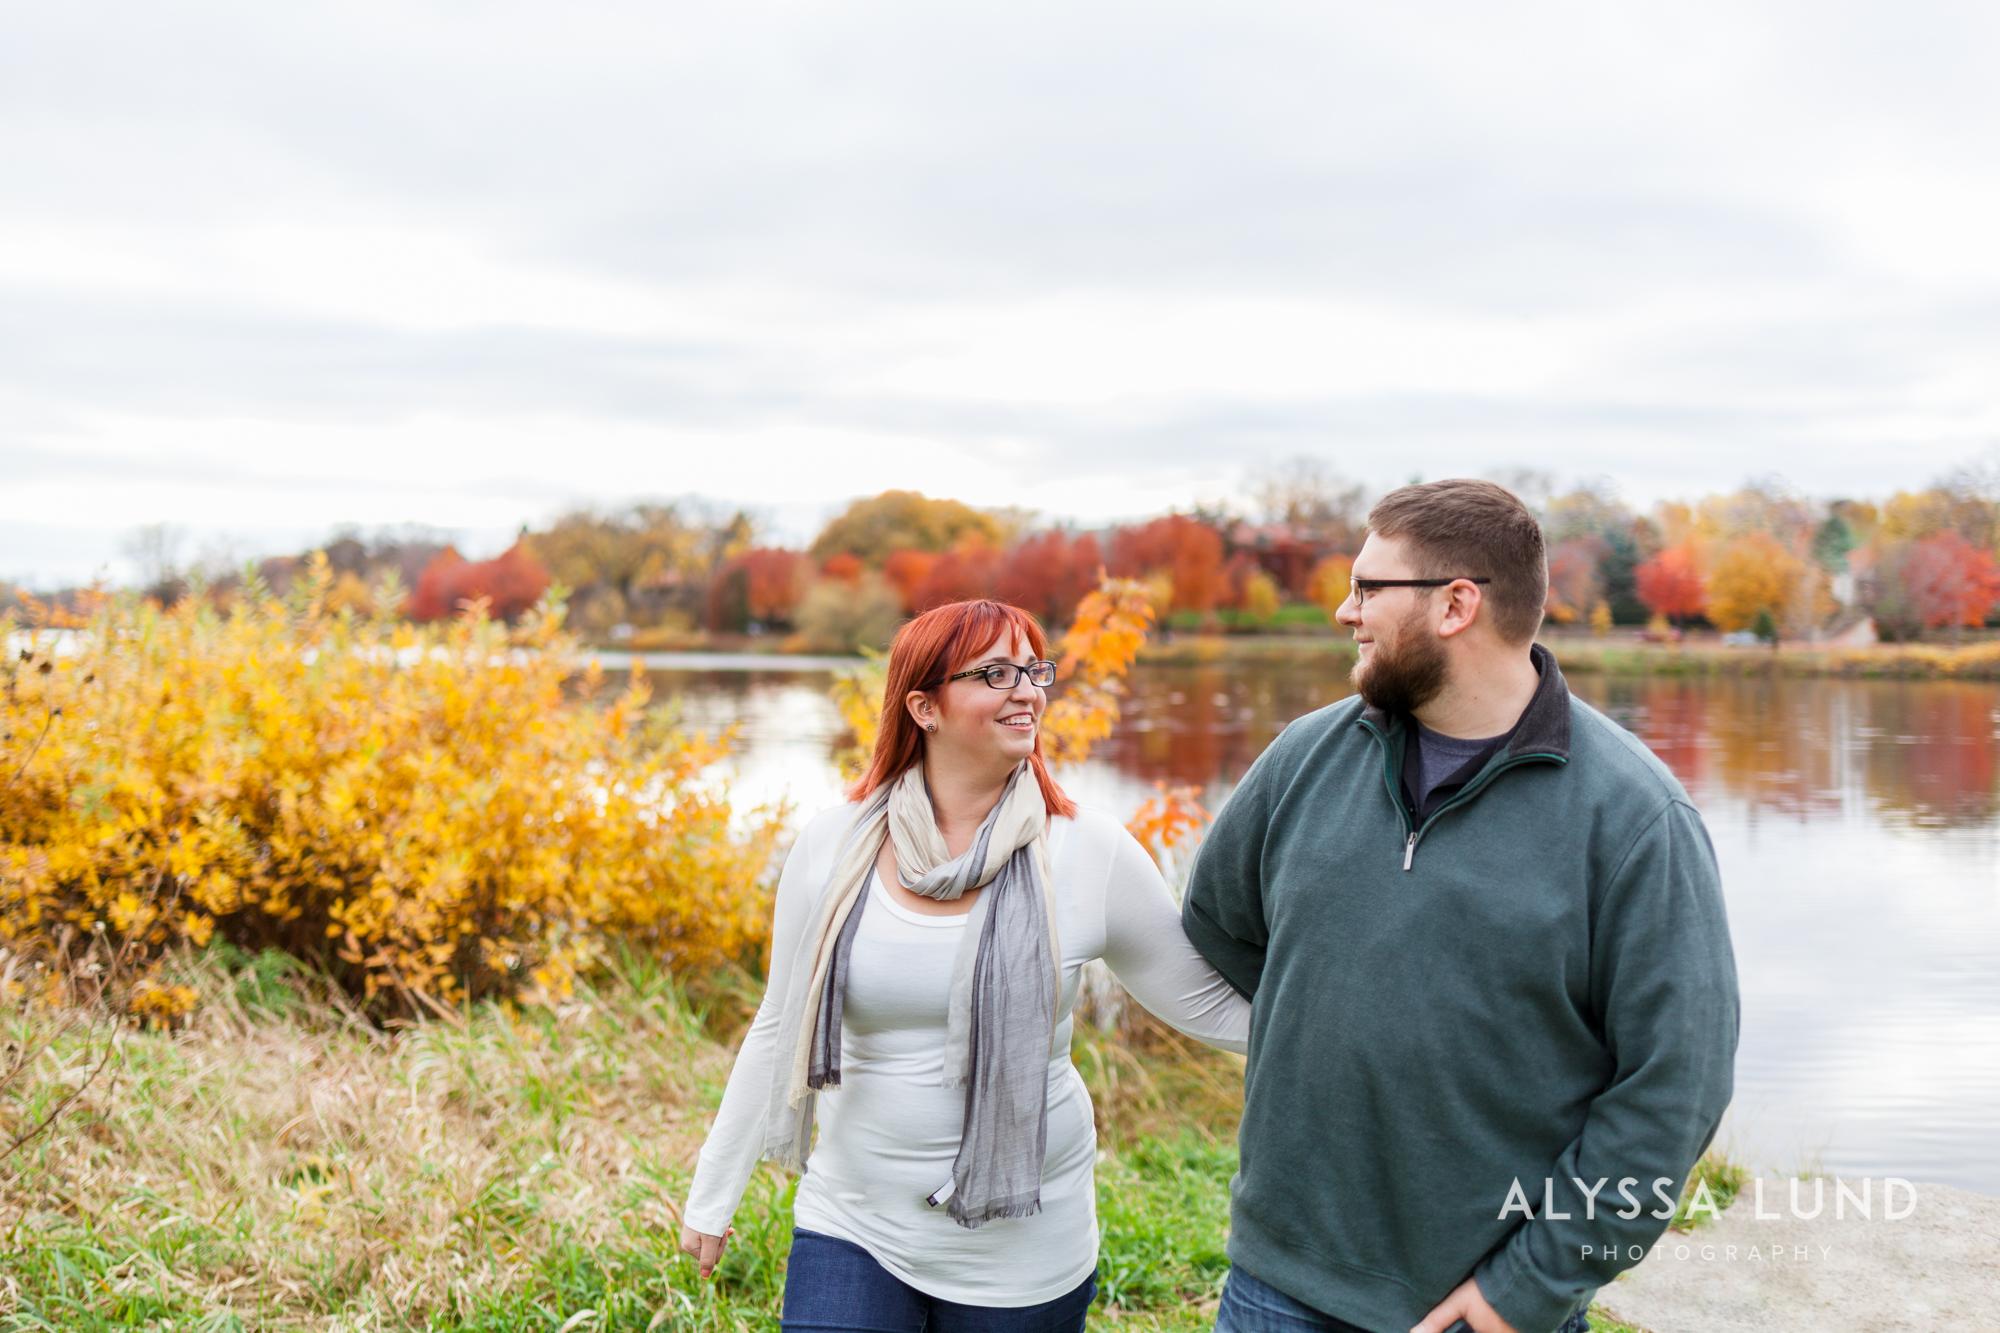 outdoor engagement portraits in Minneapolis